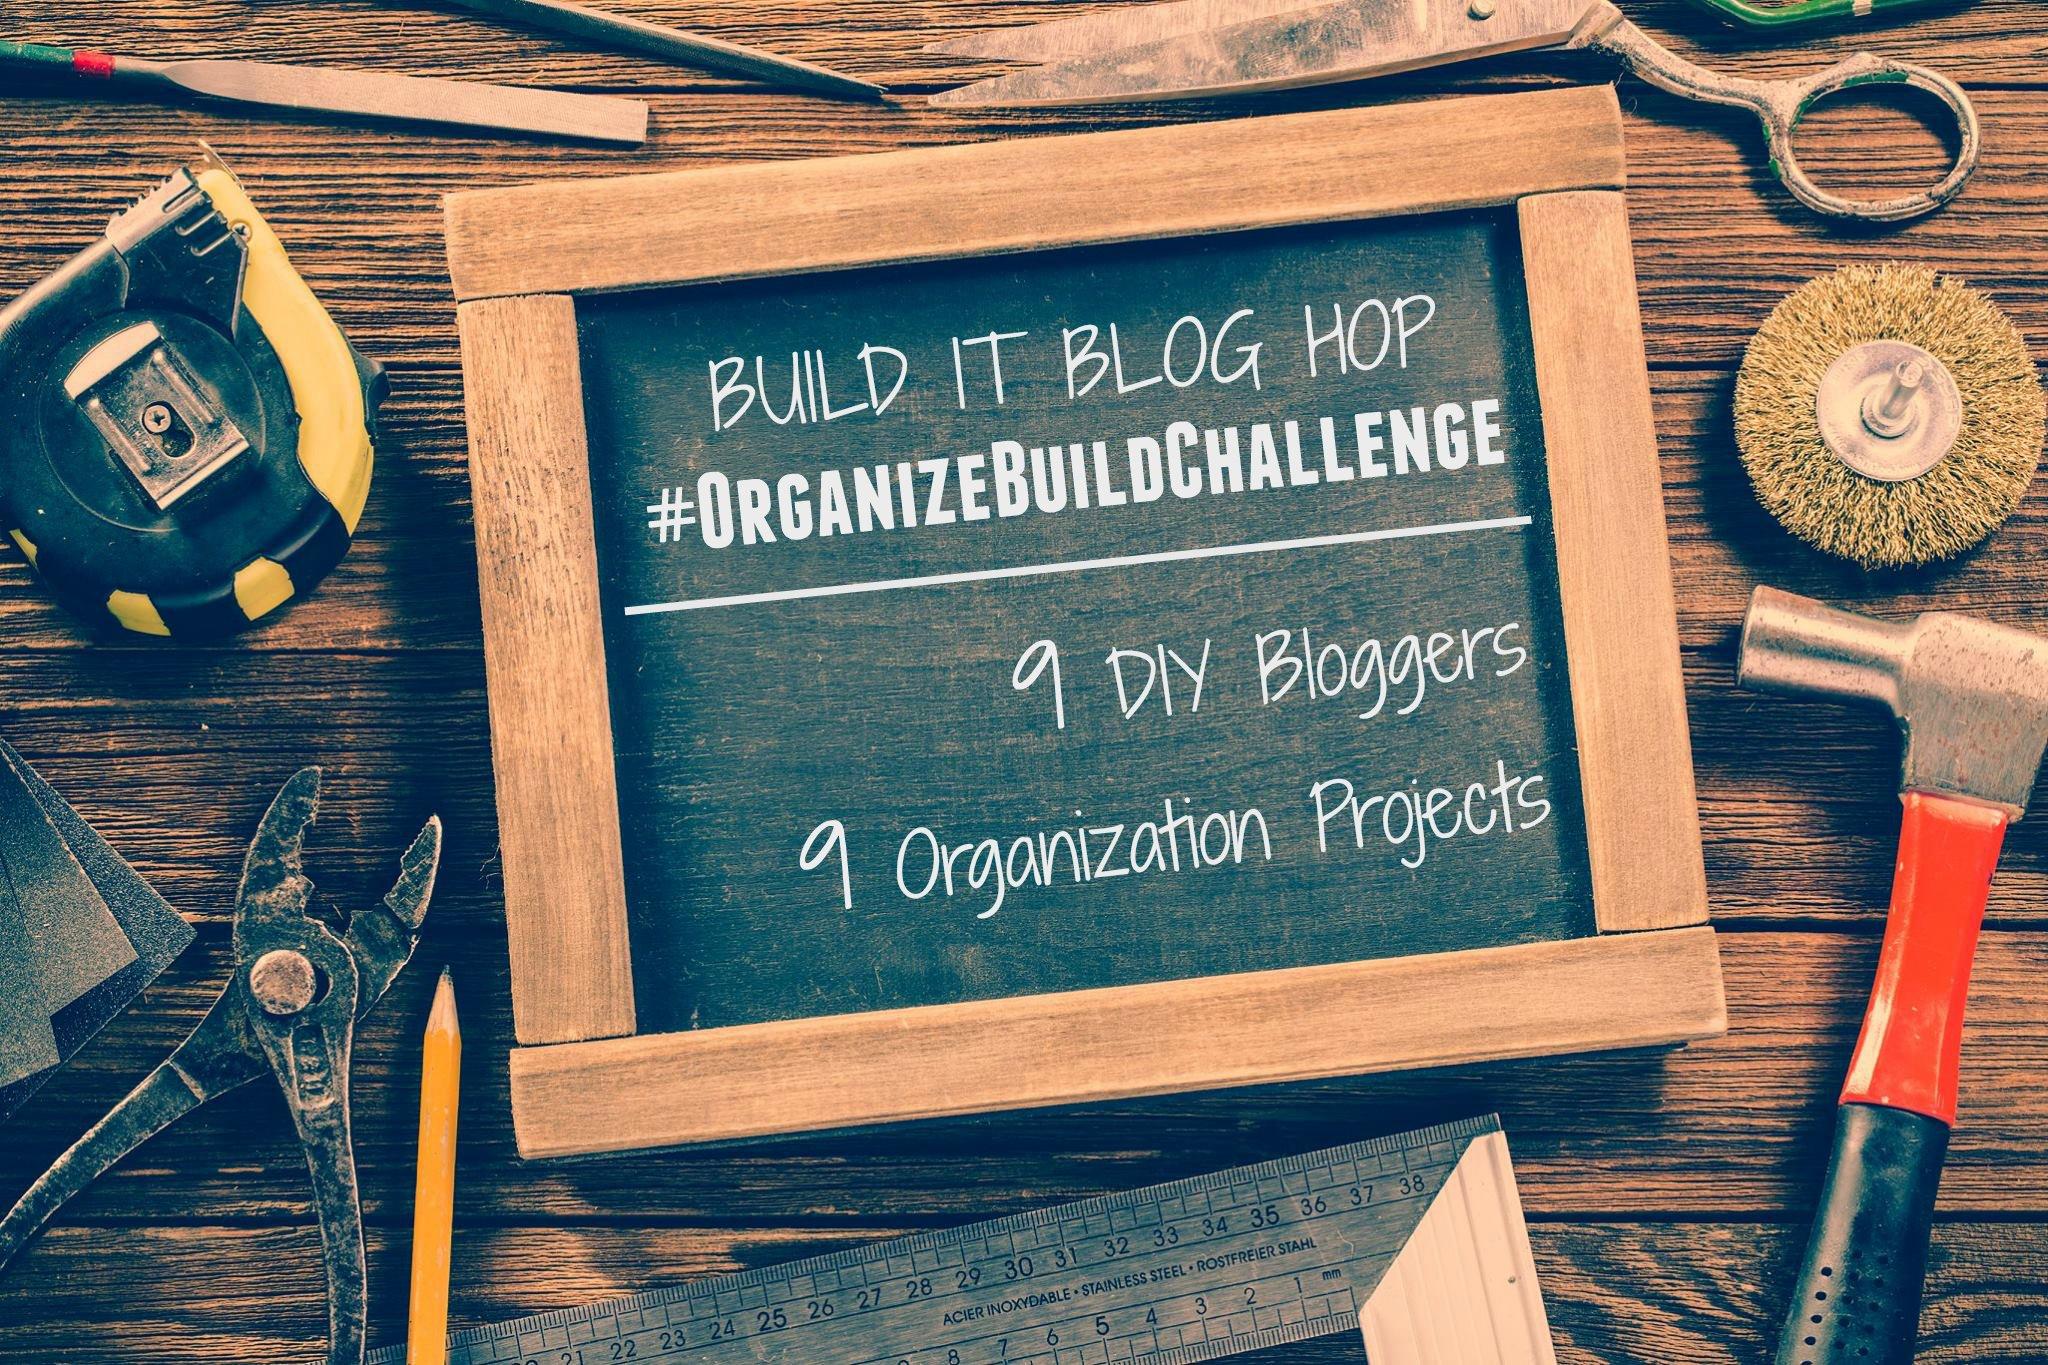 Build It Bloghop on funkyjunkinteriors.net